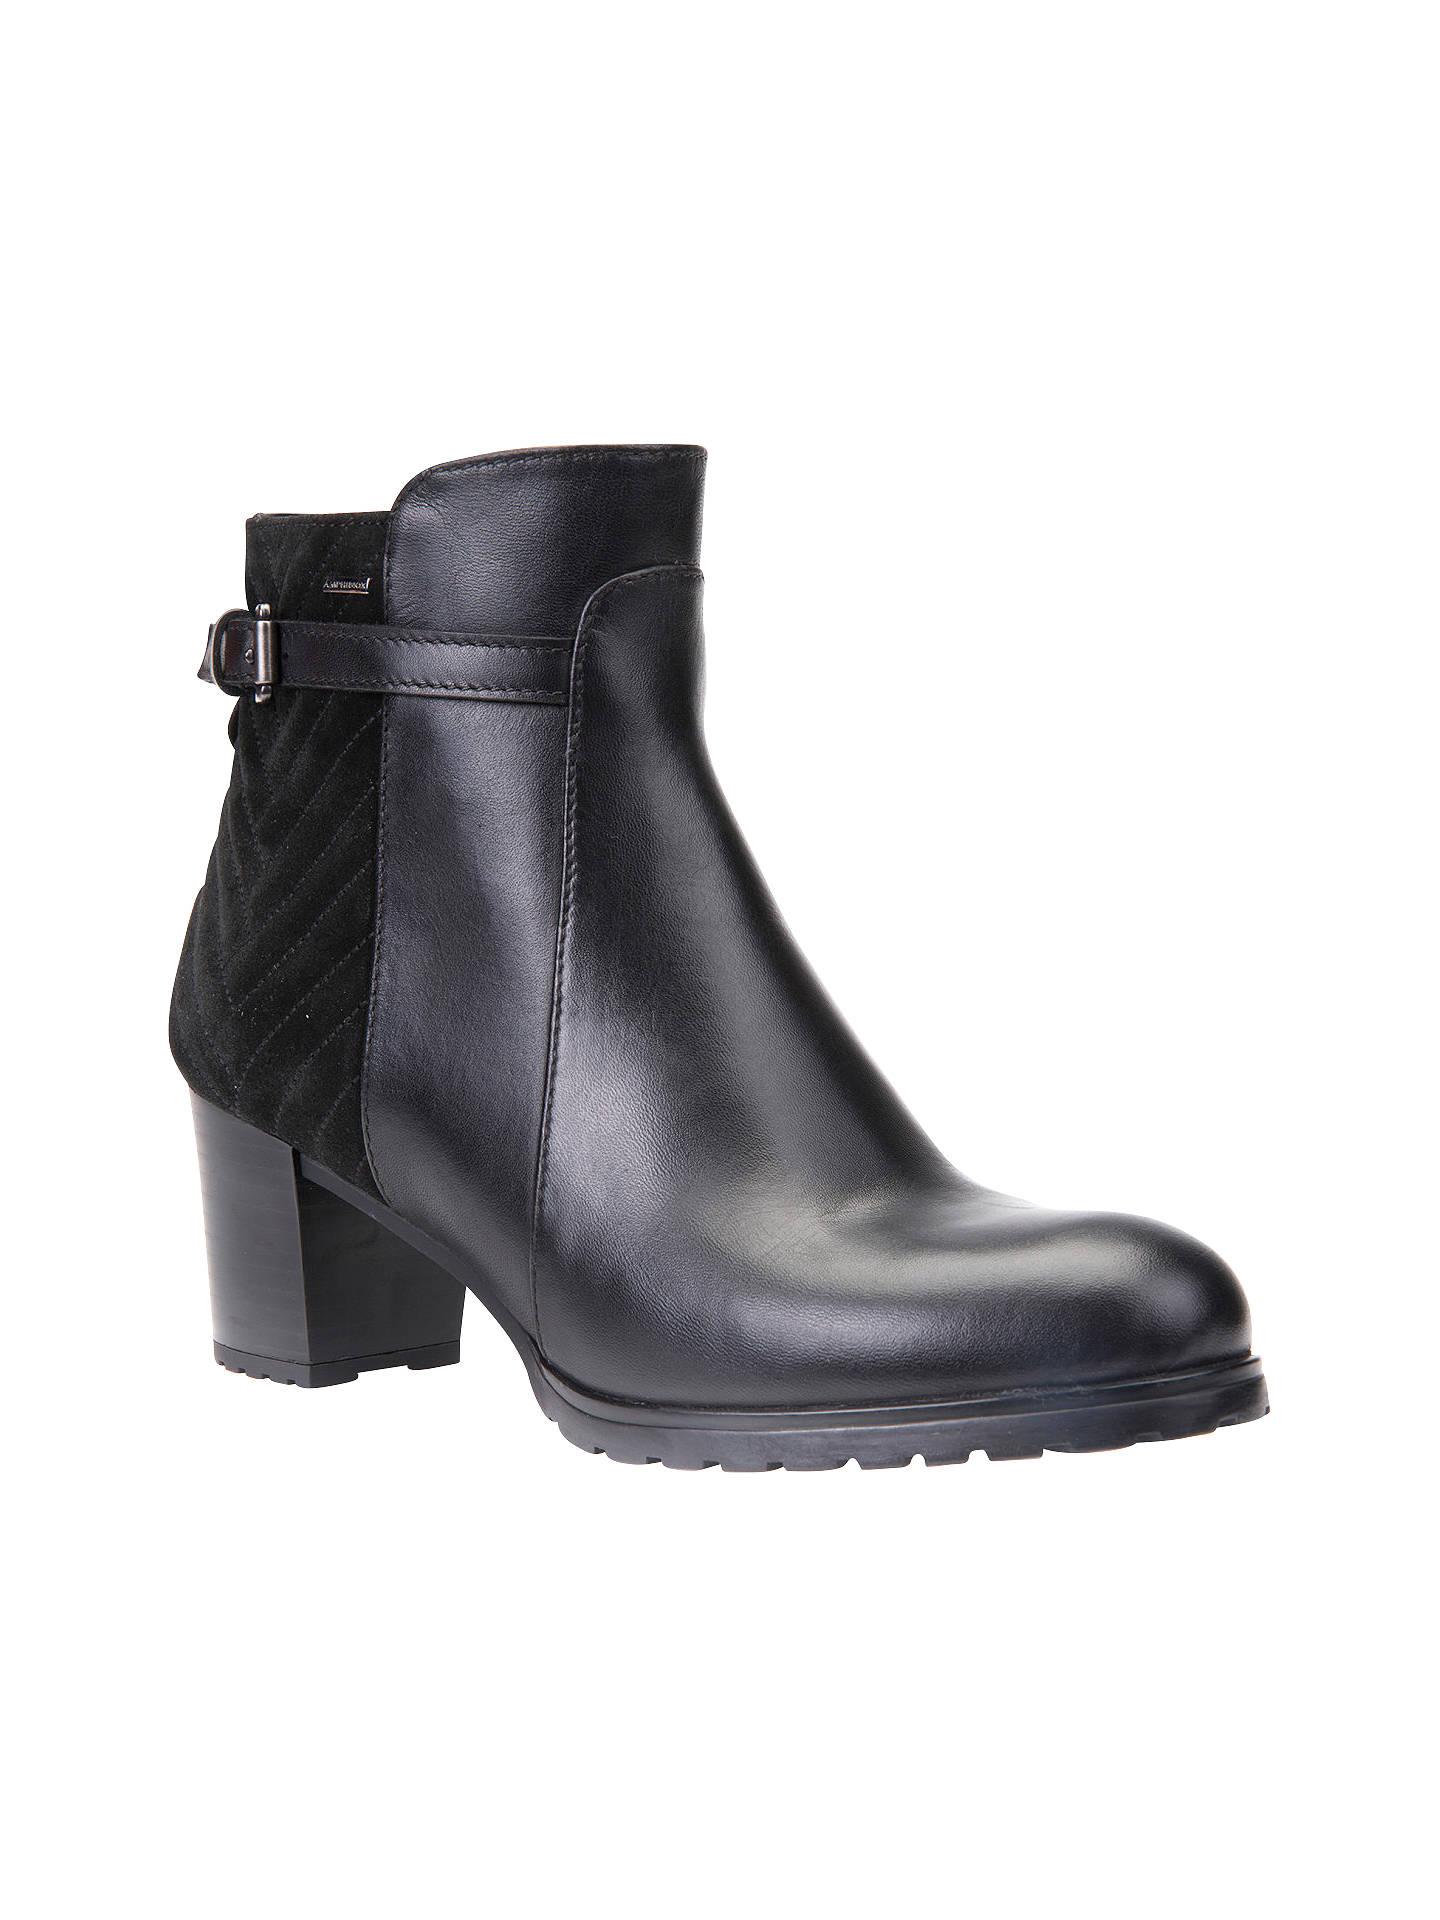 b9c37c97e23 Buy Geox Lise Amphibiox Waterproof Ankle Boots, Black, 3 Online at  johnlewis.com ...